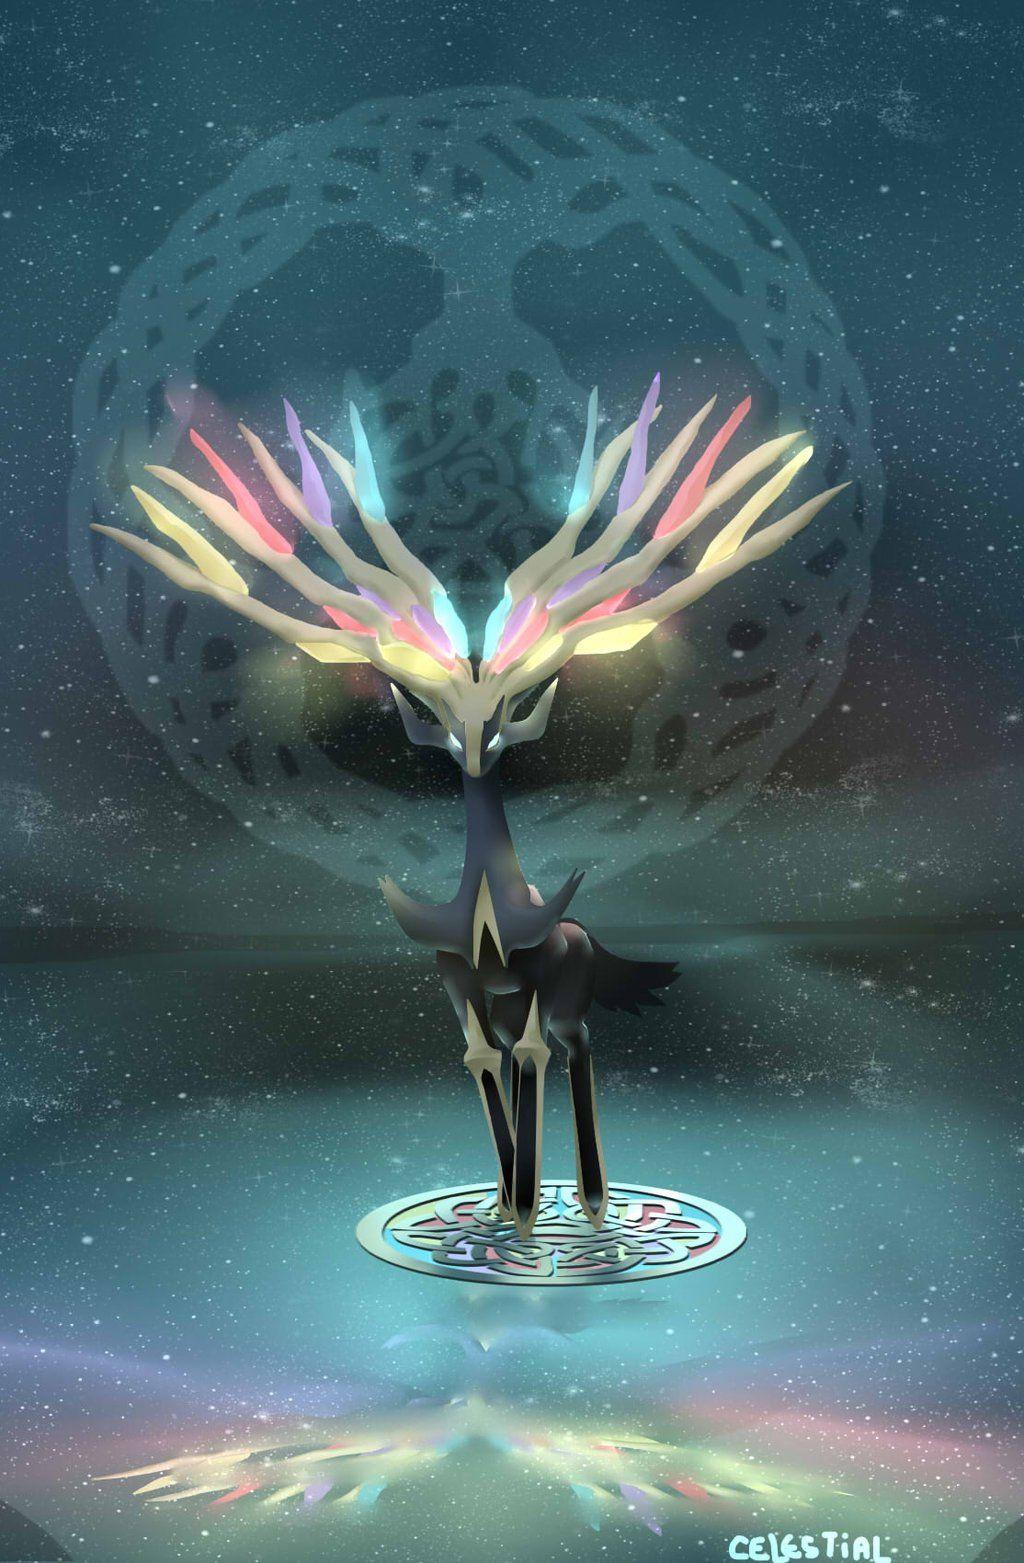 xerneas the yggdrasil guardian by celestial080deviantart